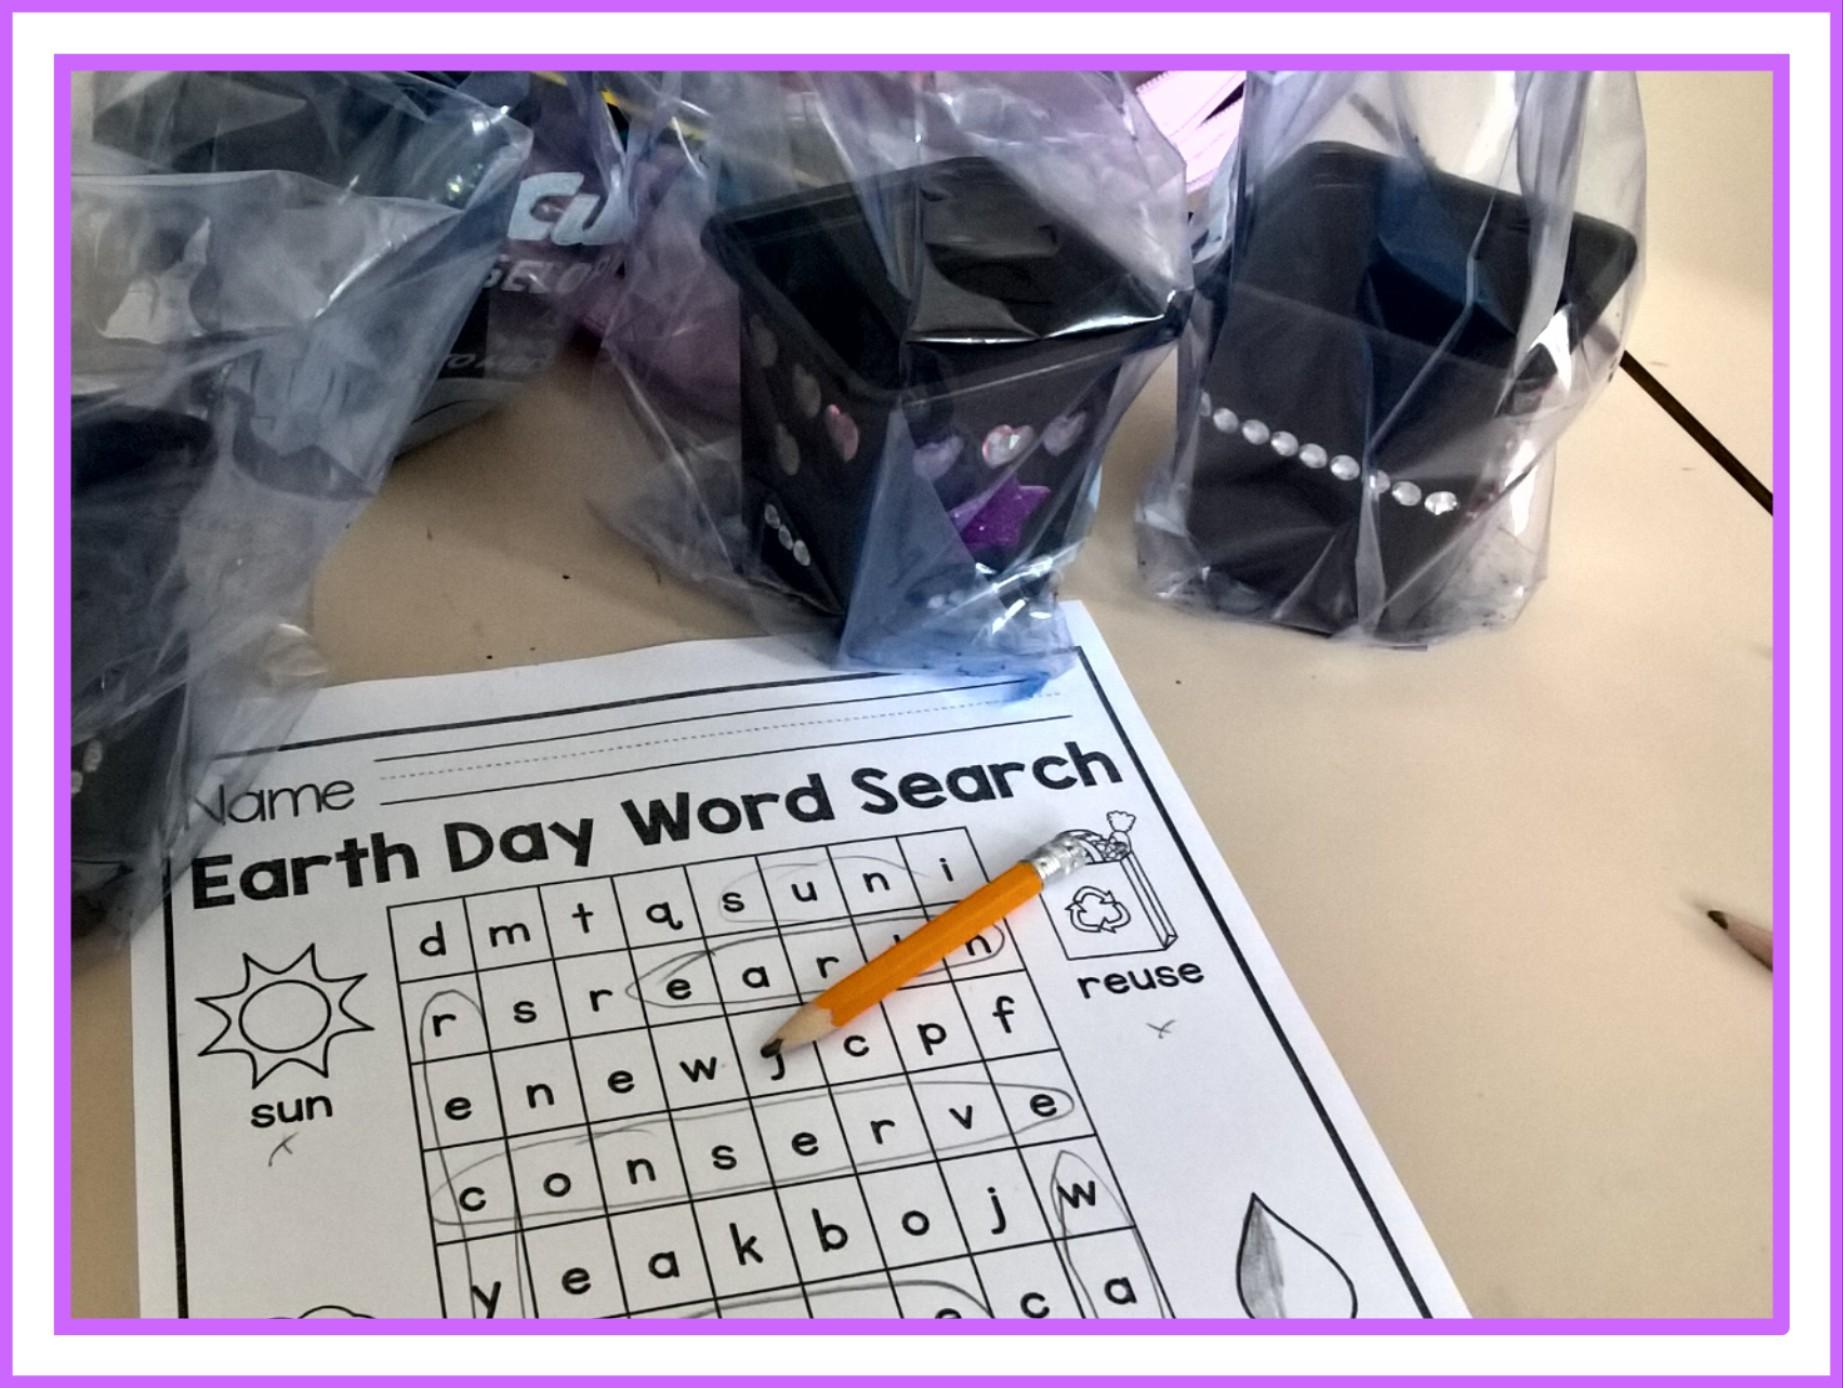 EARTH DAY WORD SEARECH